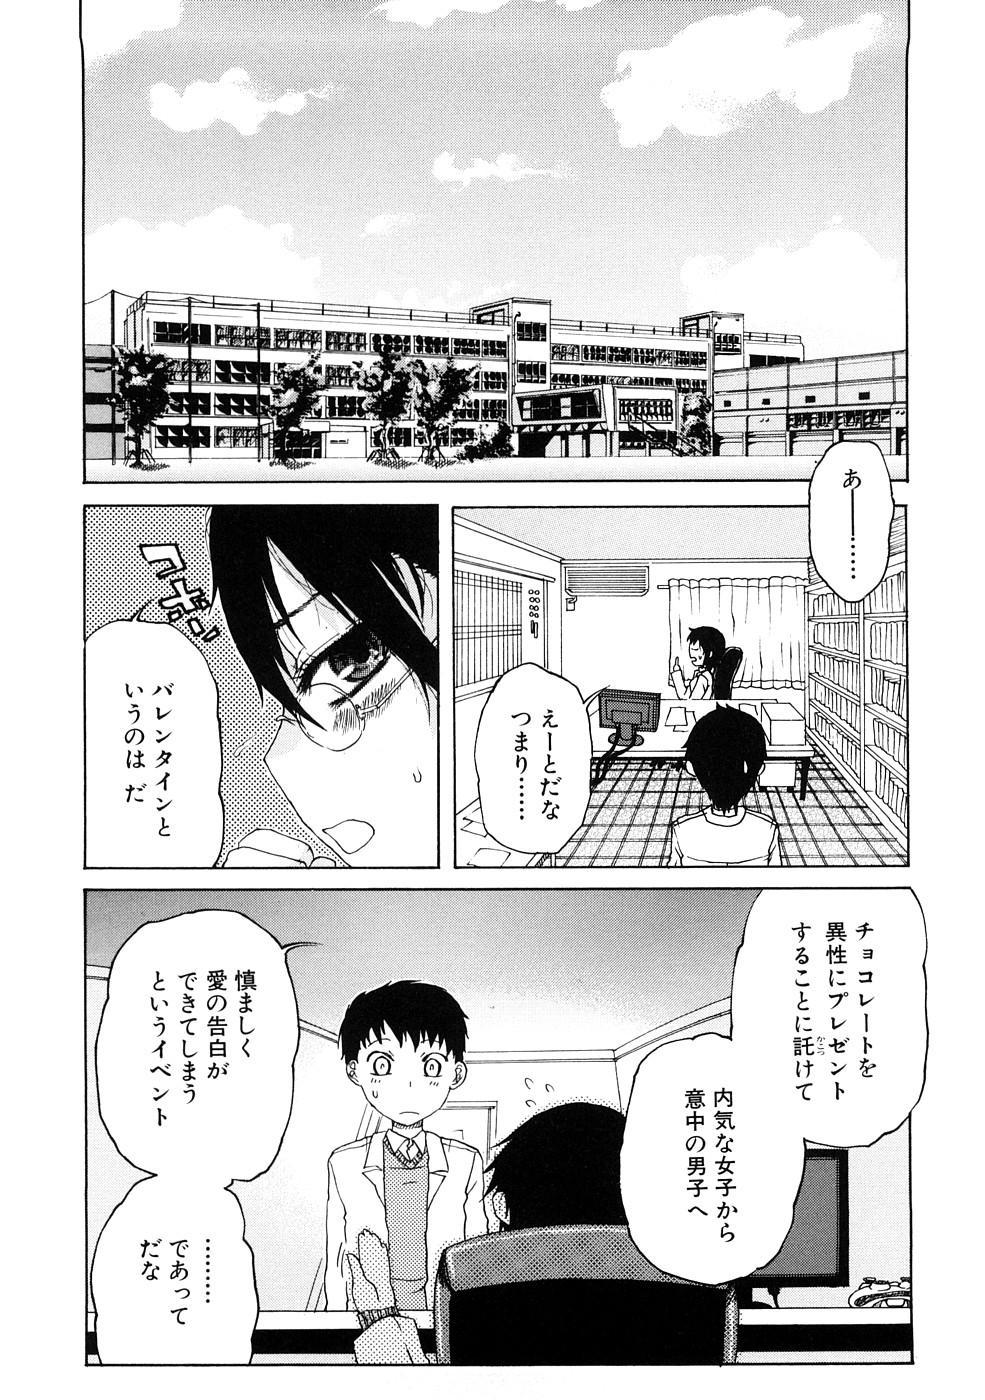 Ecchi de Jibunkatte de Kawaii Ko 51